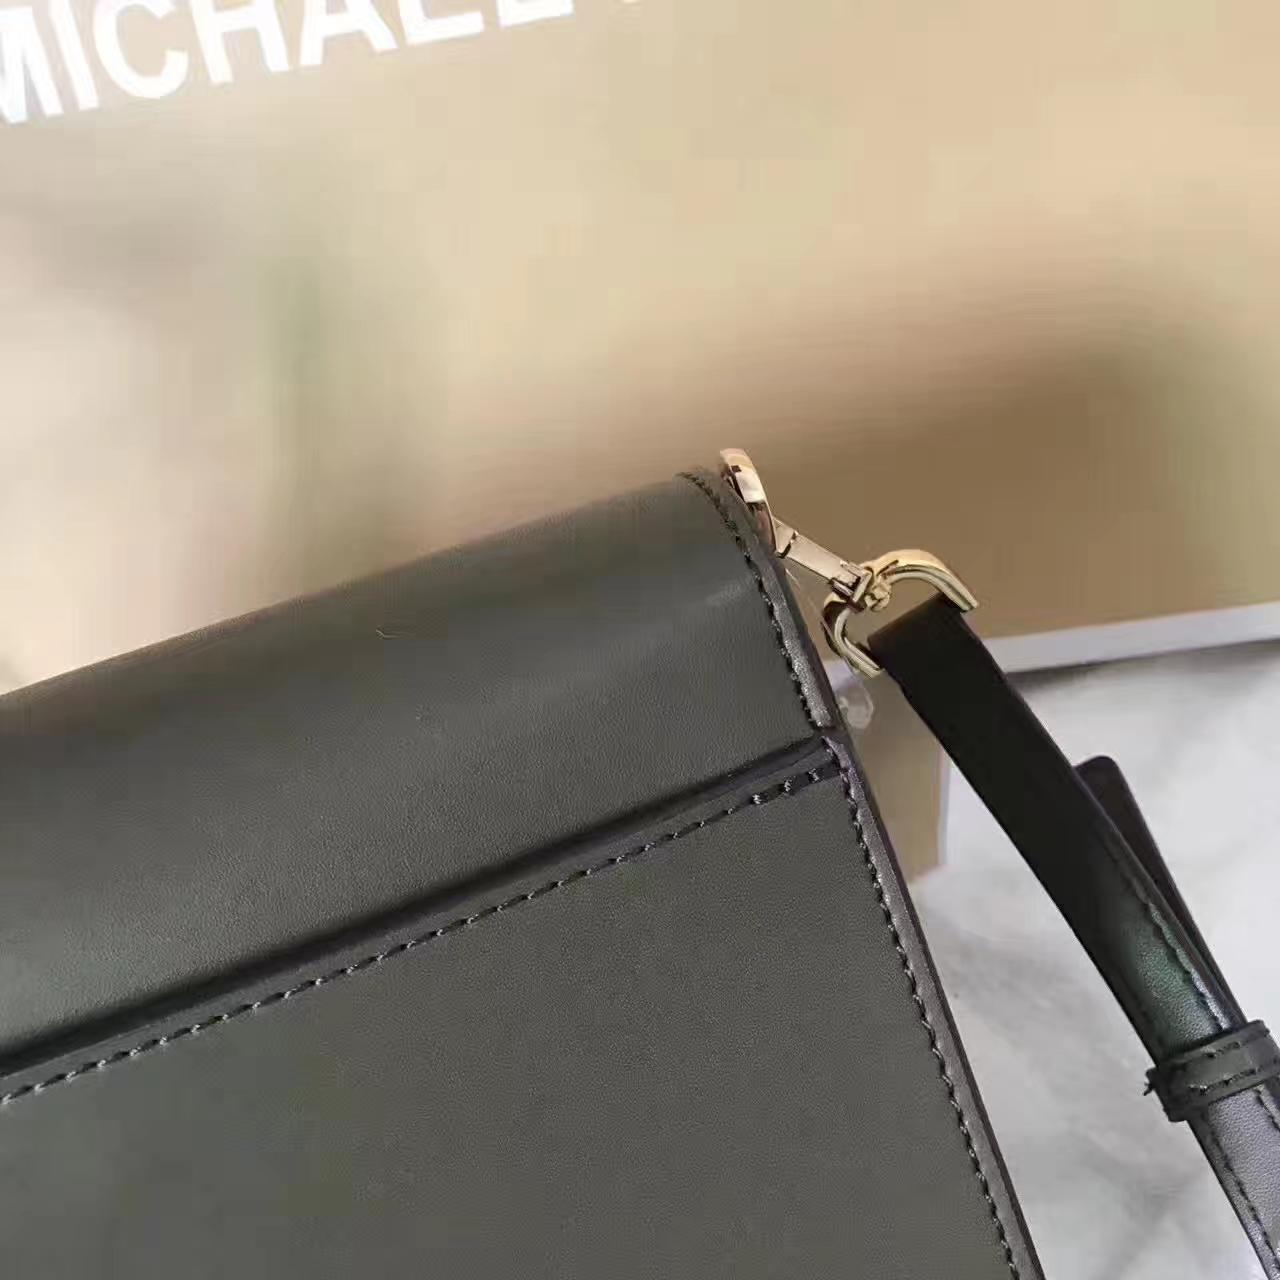 MK SloaoEditor迈克科尔斯杨幂同款橄榄绿色纳帕牛皮单肩斜挎包23CM